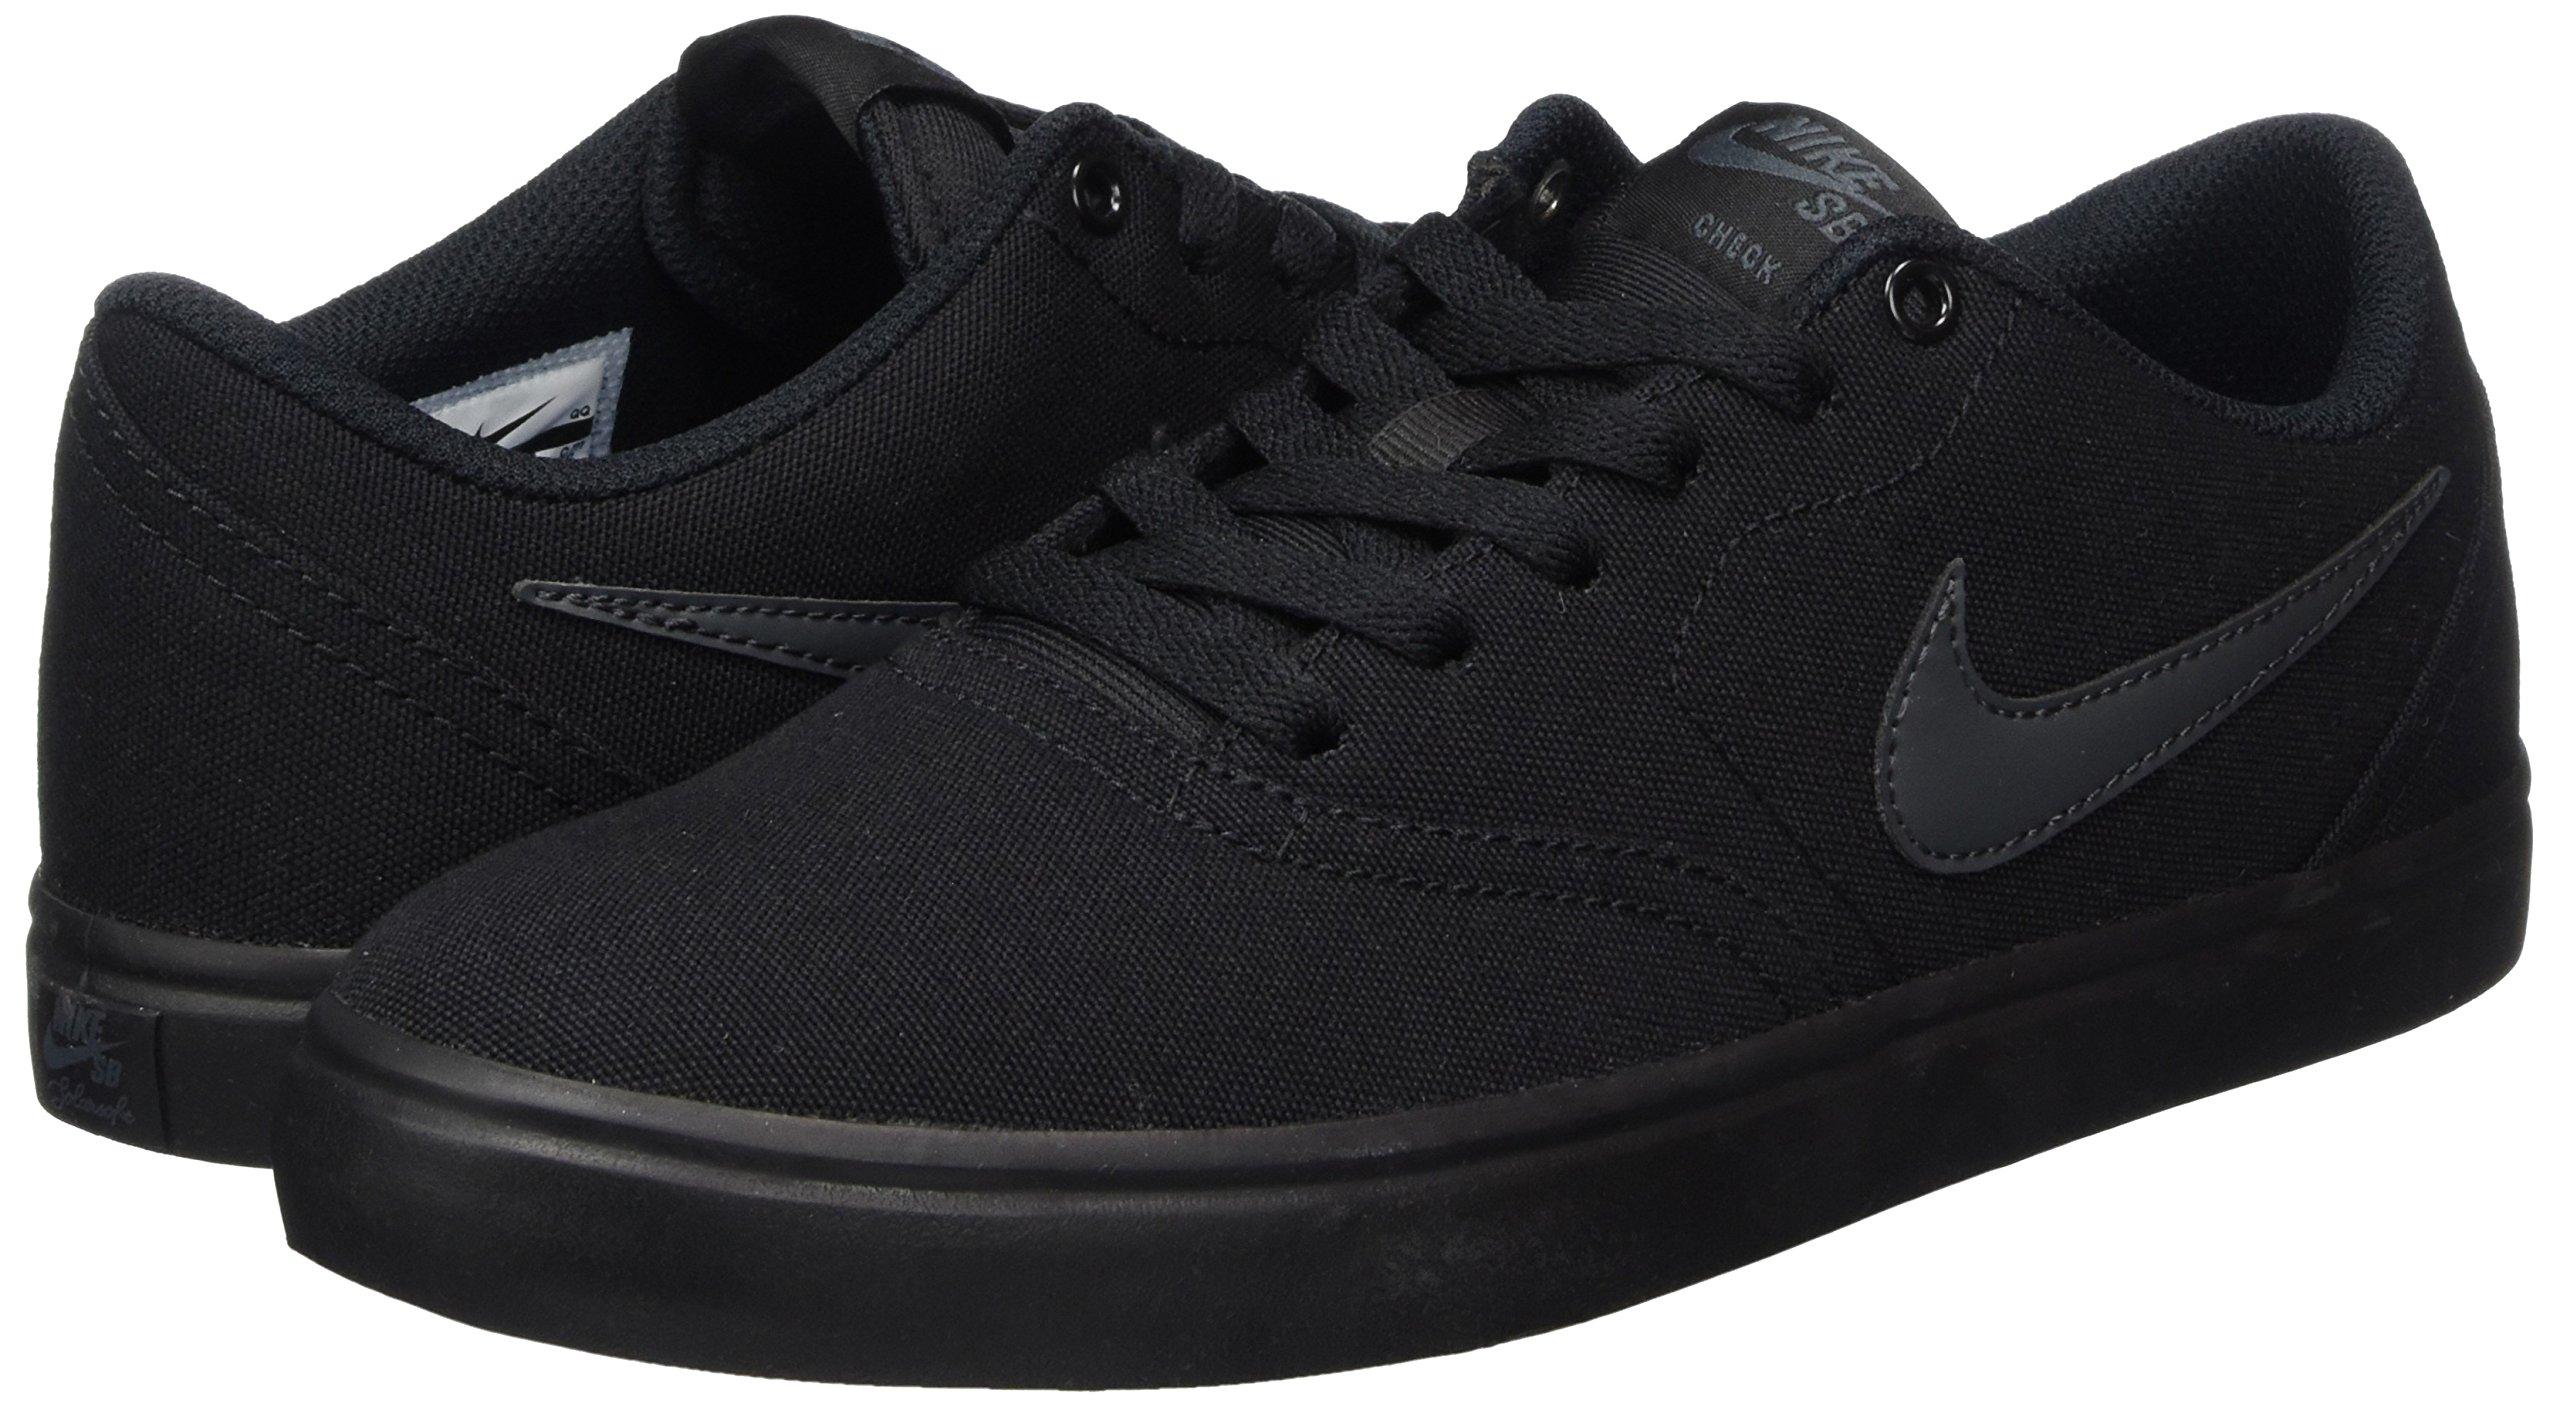 Nike Unisex SB Check Solar CNVS Black/Anthracite Skate Shoe 8.5 Men US / 10 Women US by Nike (Image #5)